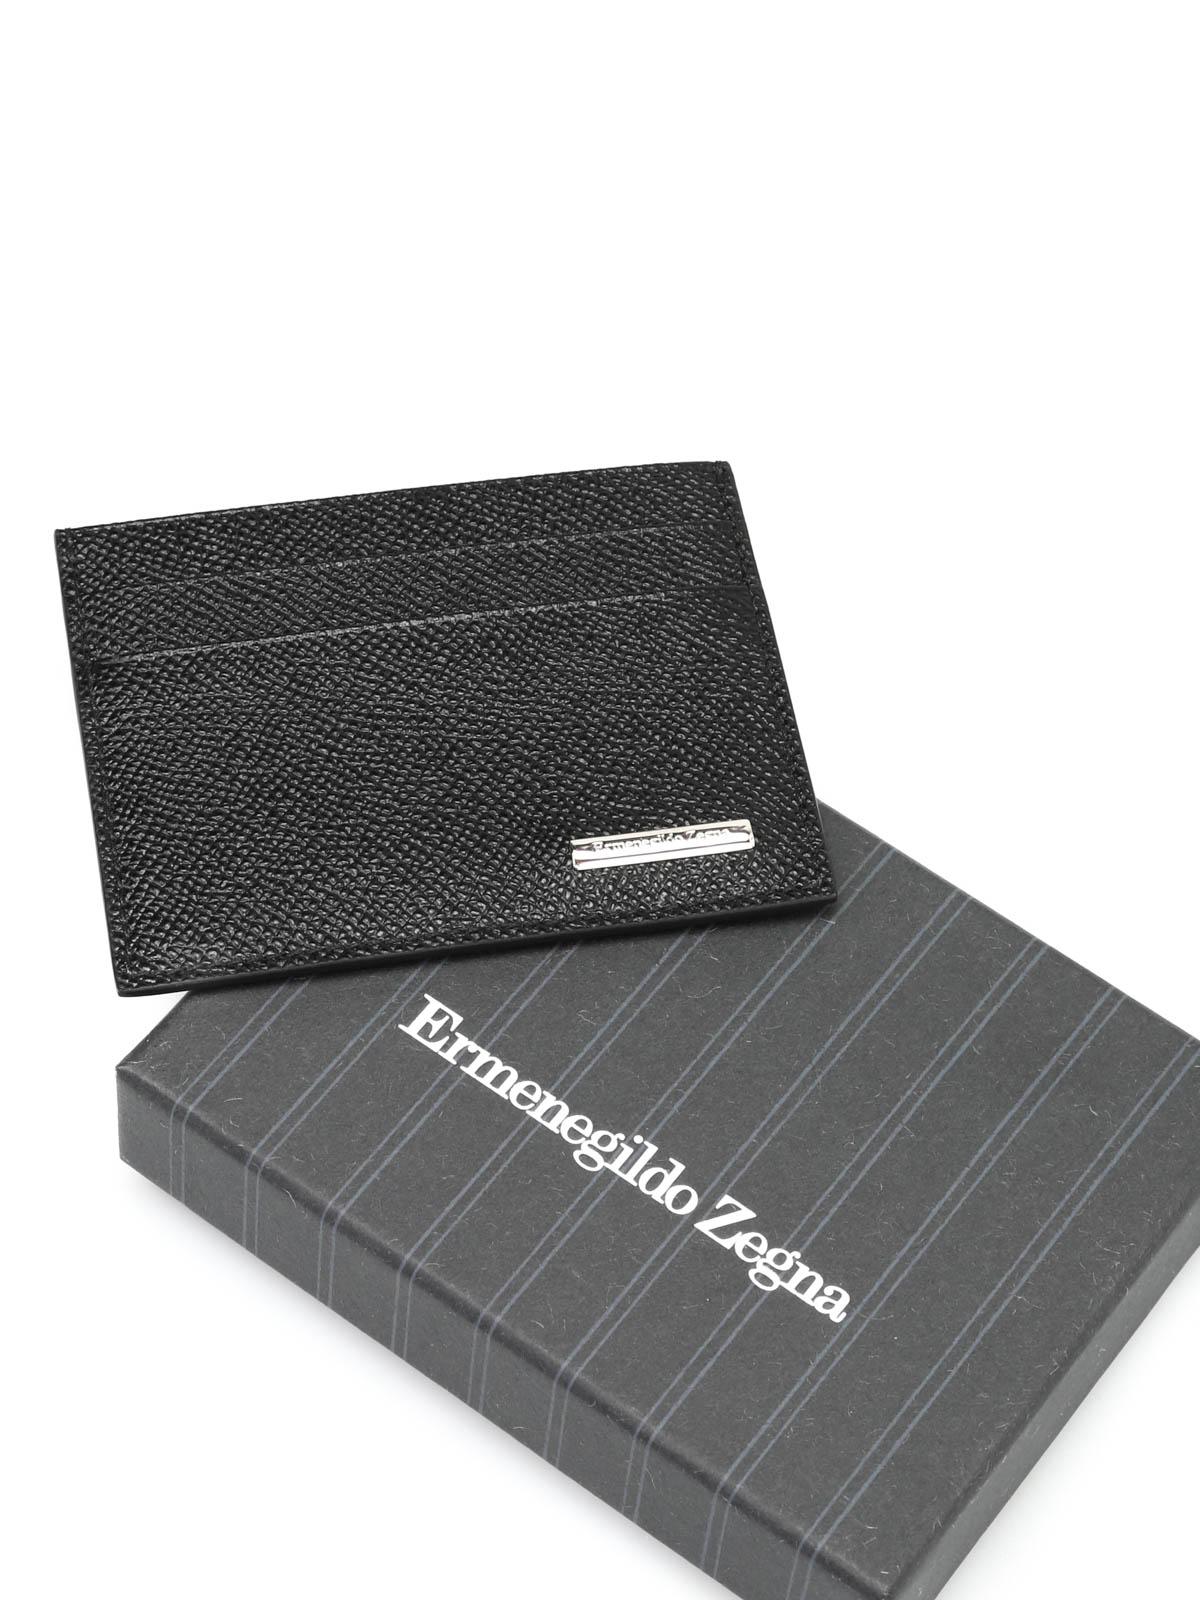 Grained leather card case by ermenegildo zegna wallets purses grained leather card case shop online ermenegildo zegna reheart Images